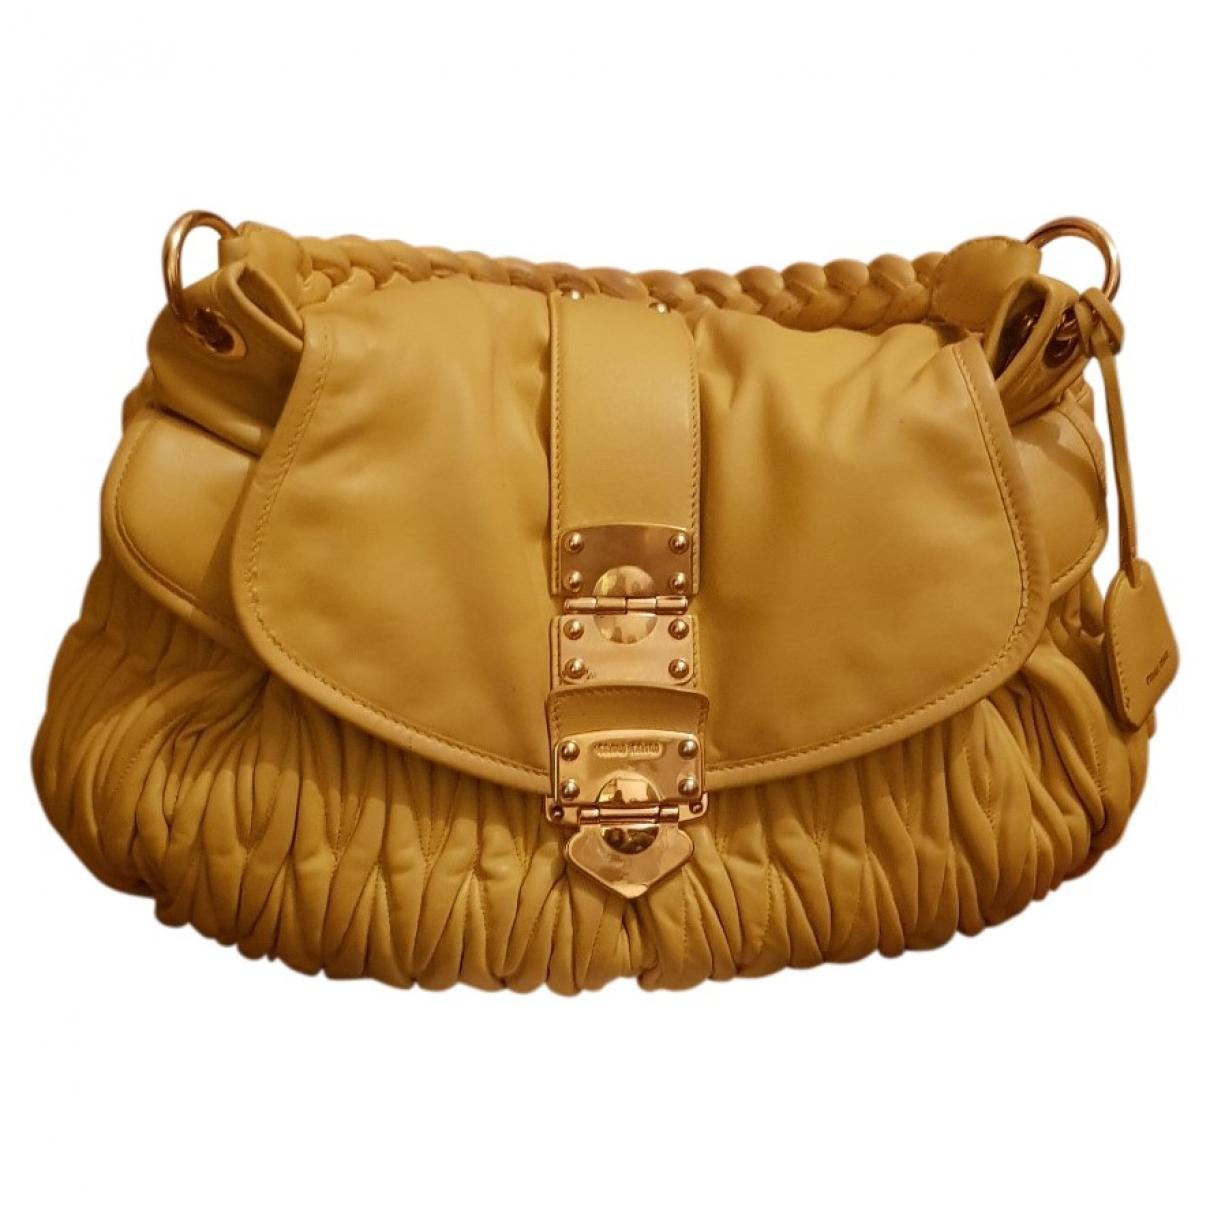 Miu Miu Matelasse Handtasche in  Gelb Leder